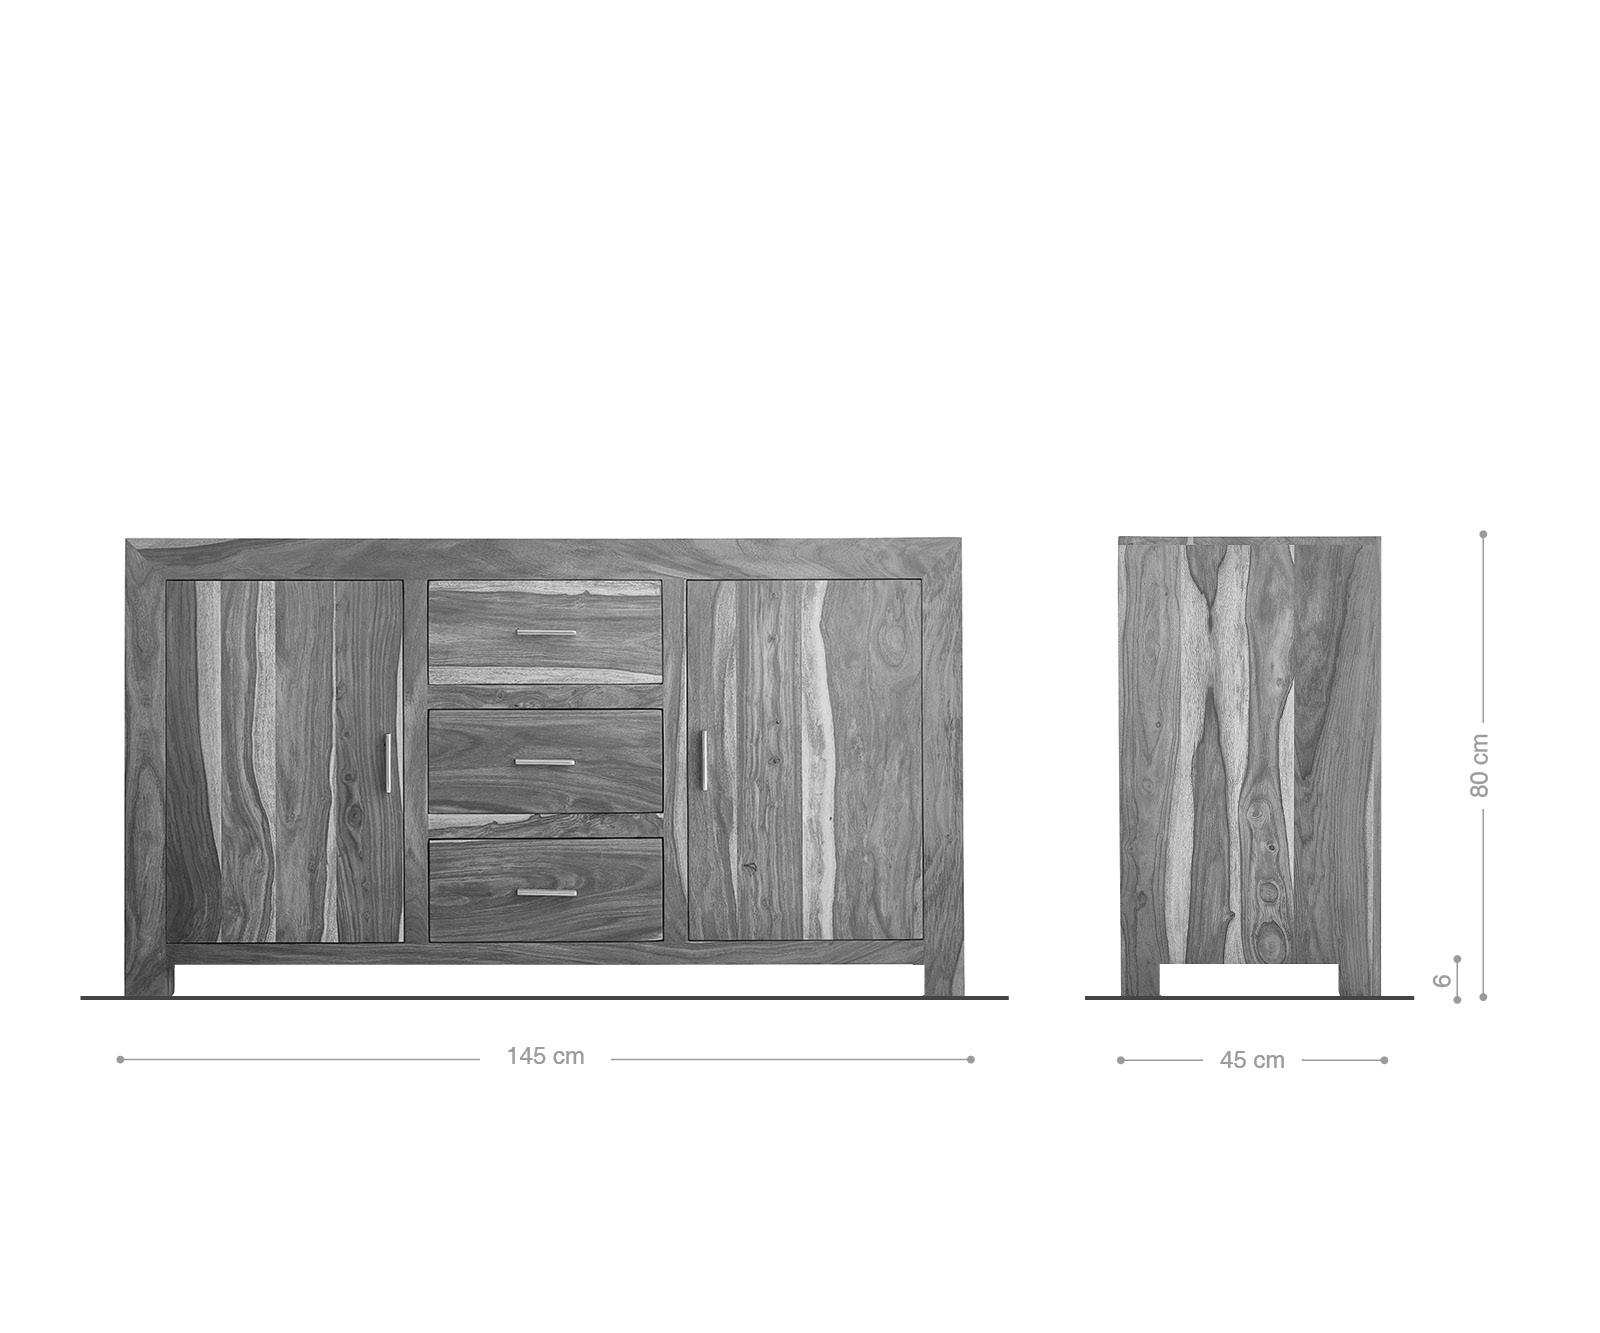 DELIFE Sideboard Indra 145 cm Sheesham Natur 3 Schübe 2 Türen, Sideboards